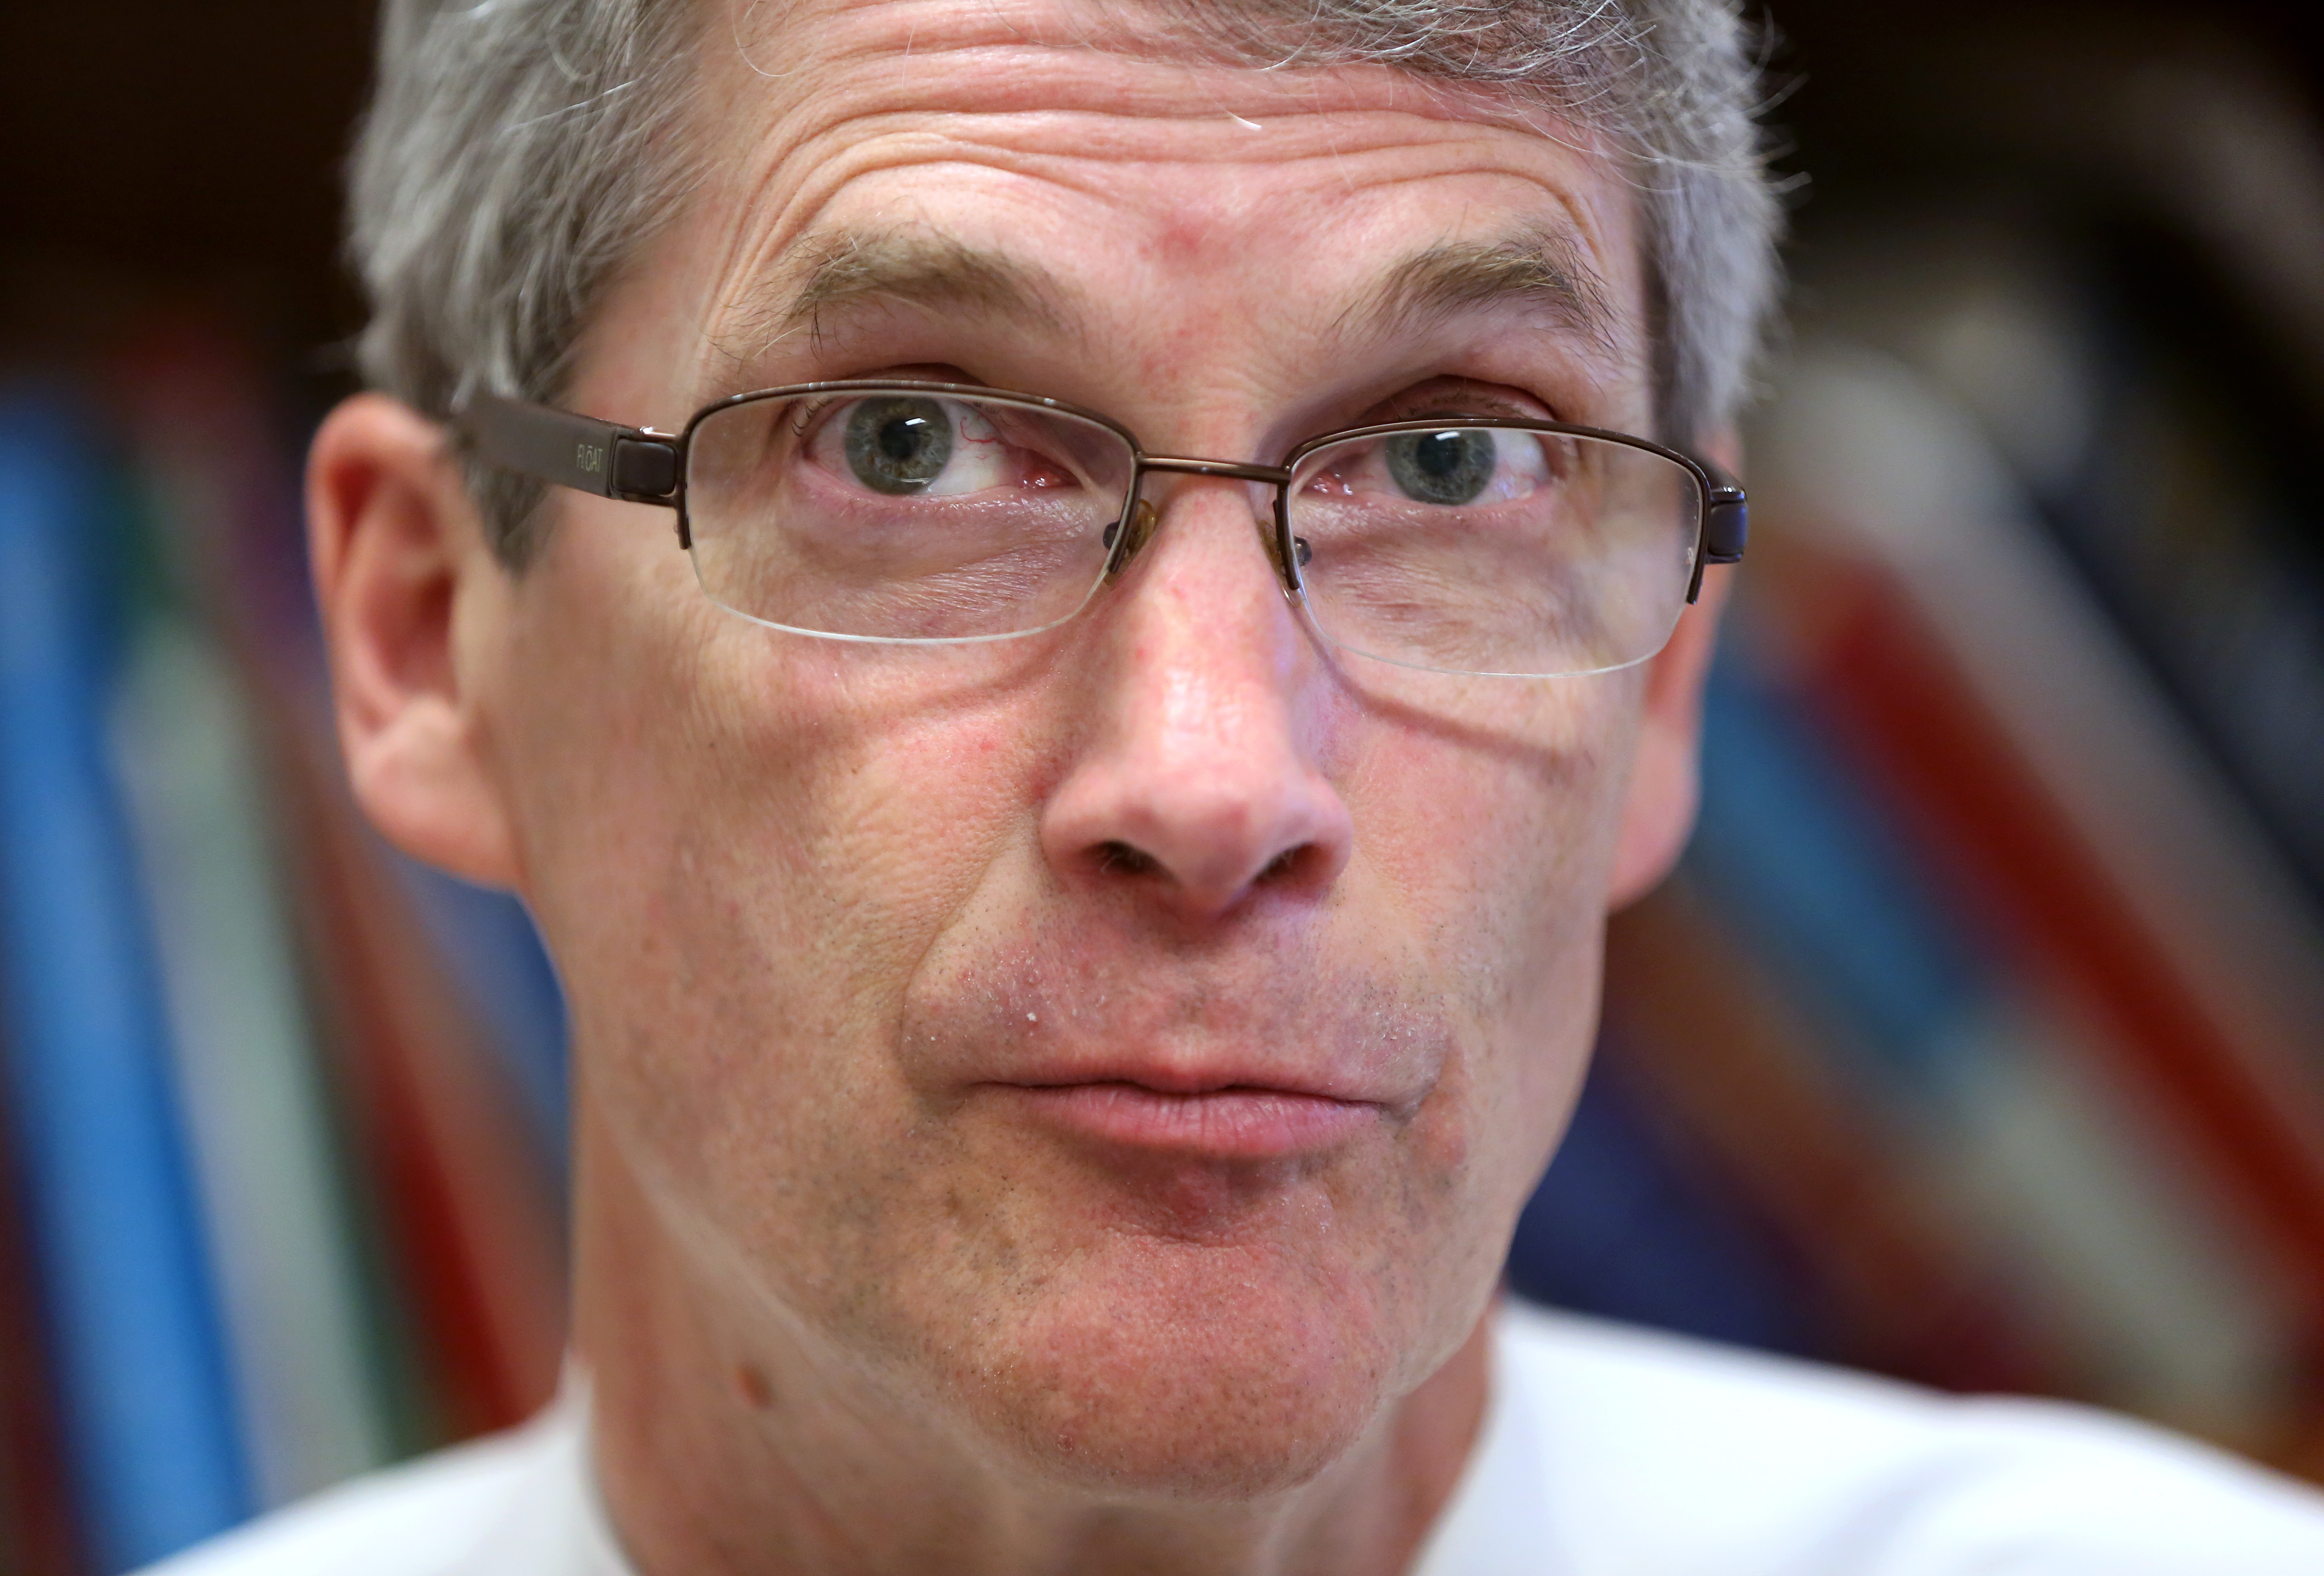 Hazards tied to medical records rush - The Boston Globe